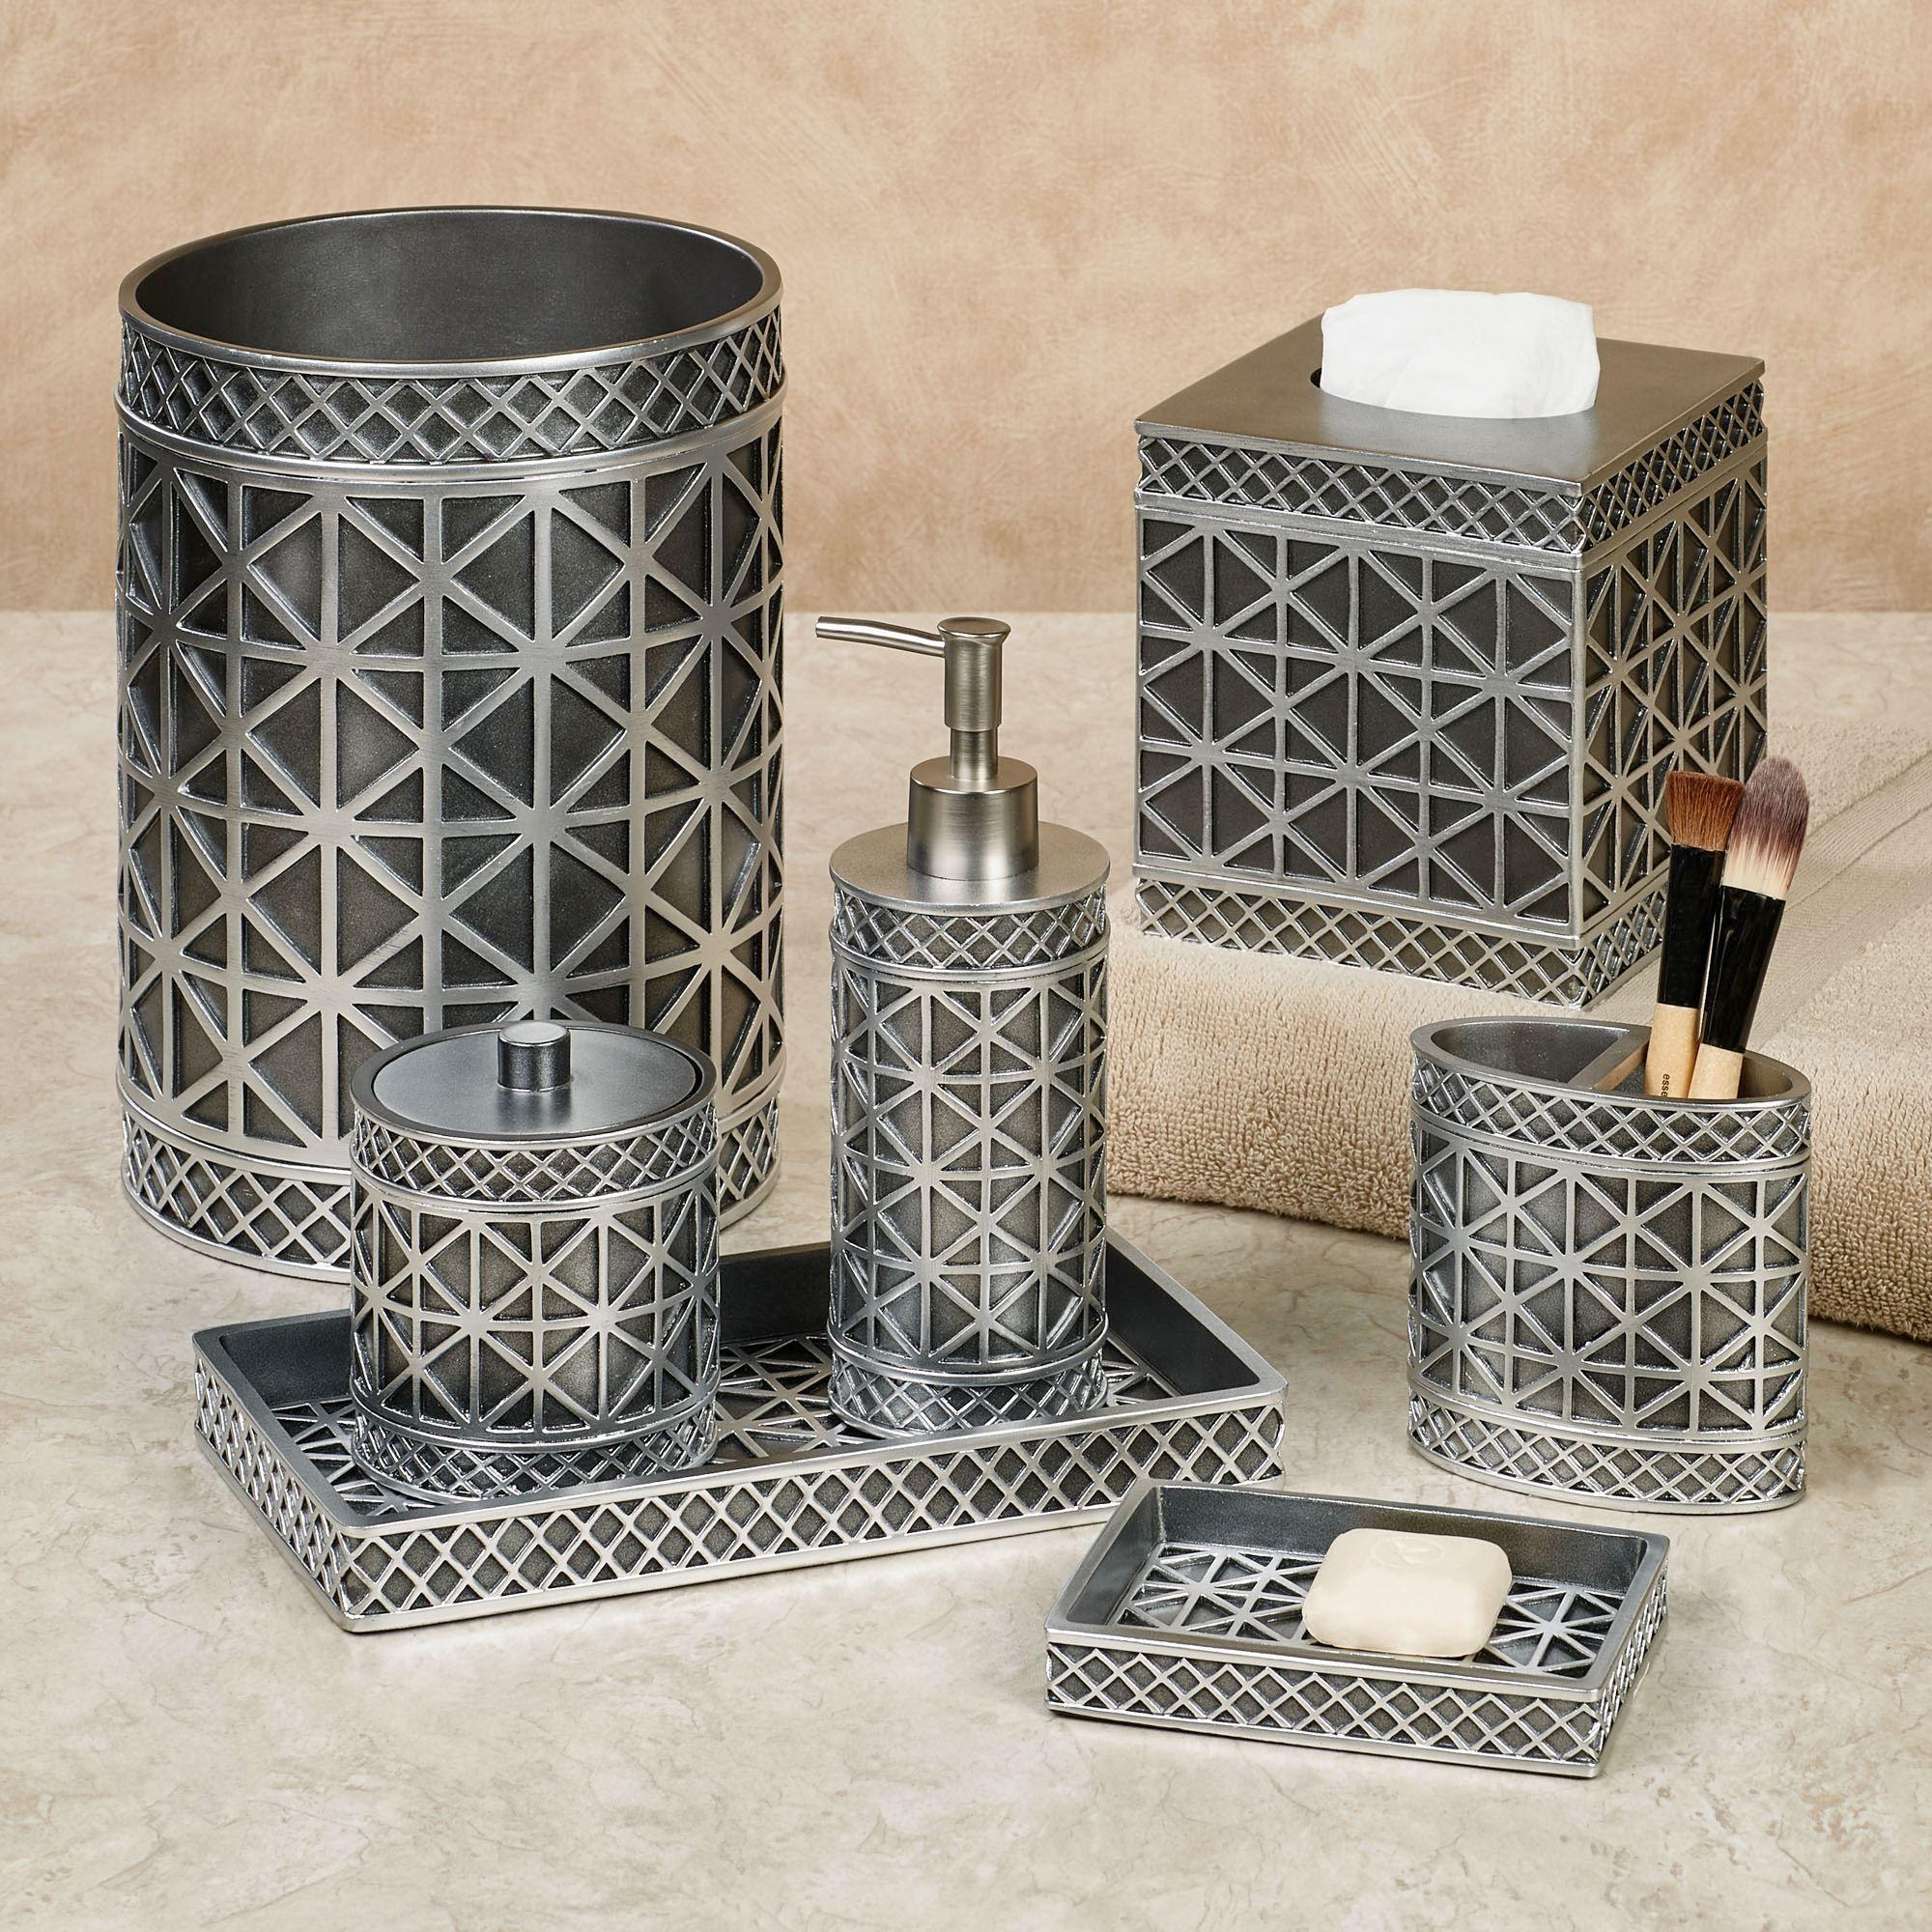 Eiffel Tower Geometric Bath Accessories